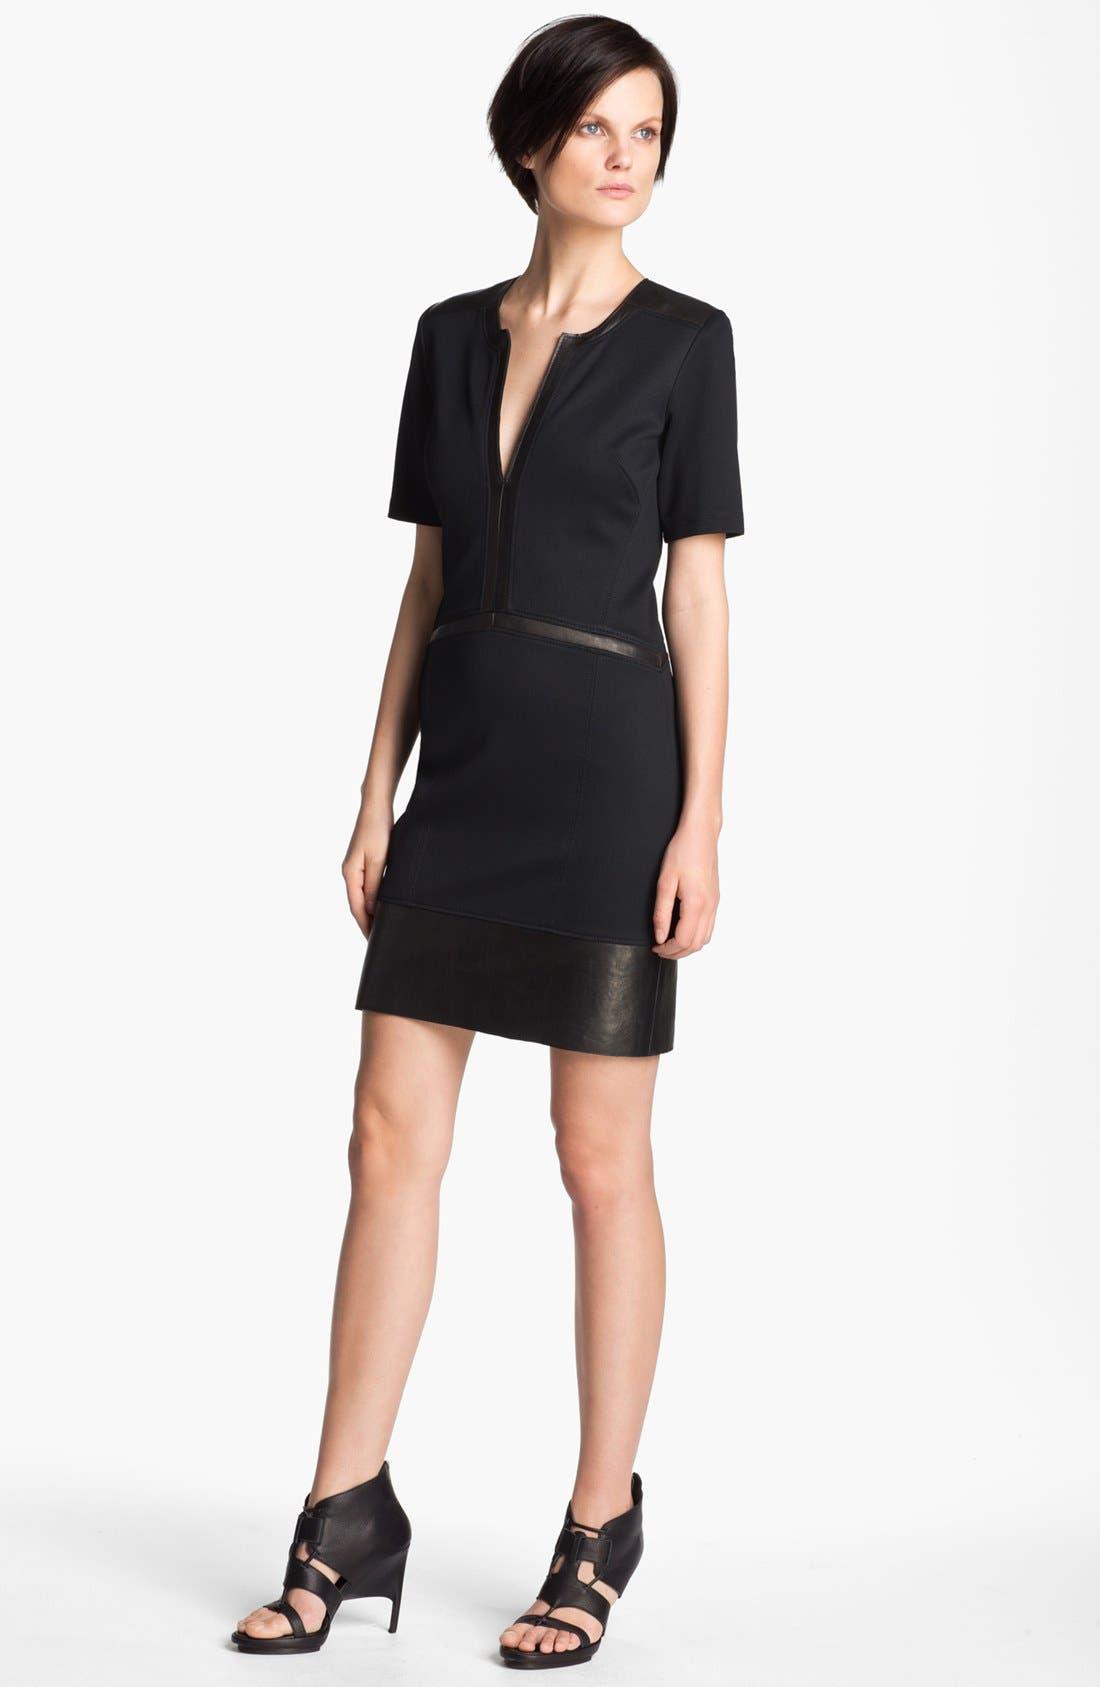 Alternate Image 1 Selected - Helmut Lang 'Motion' Leather Trim Dress